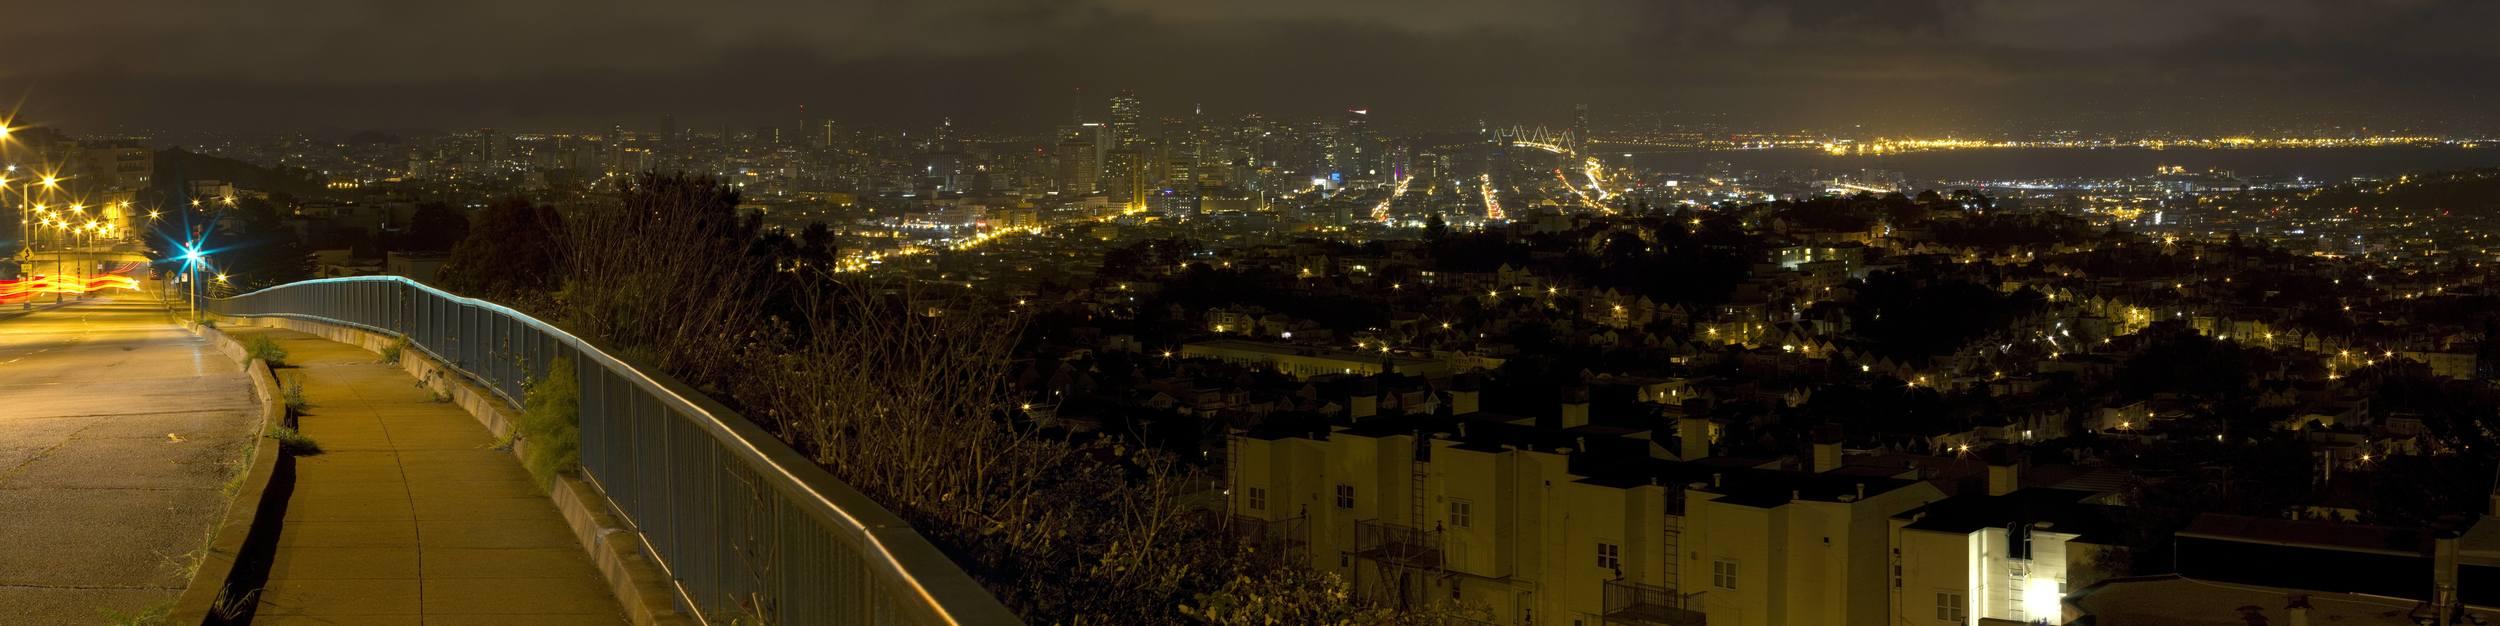 SF City Lookout Point Panarama LowRez.jpg